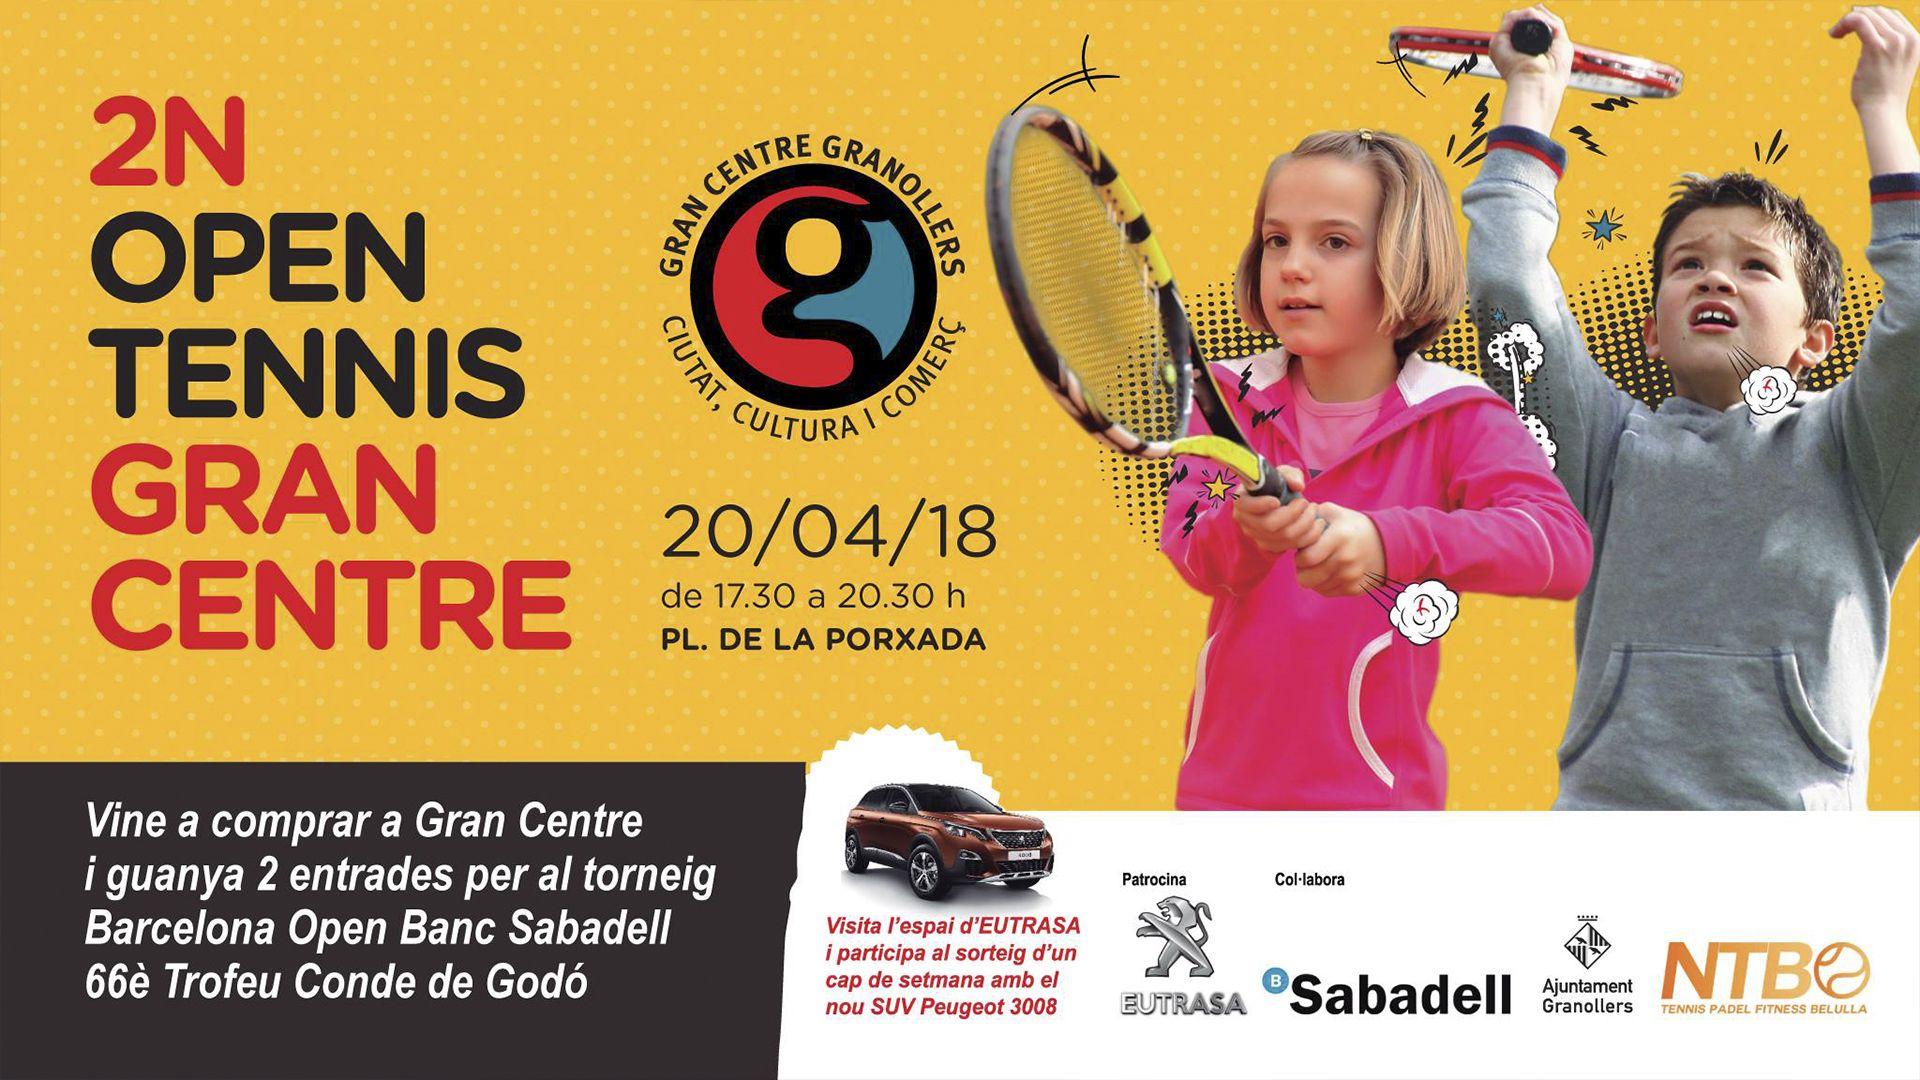 Eutrasa patrocina el 2n Open Tennis de Granollers